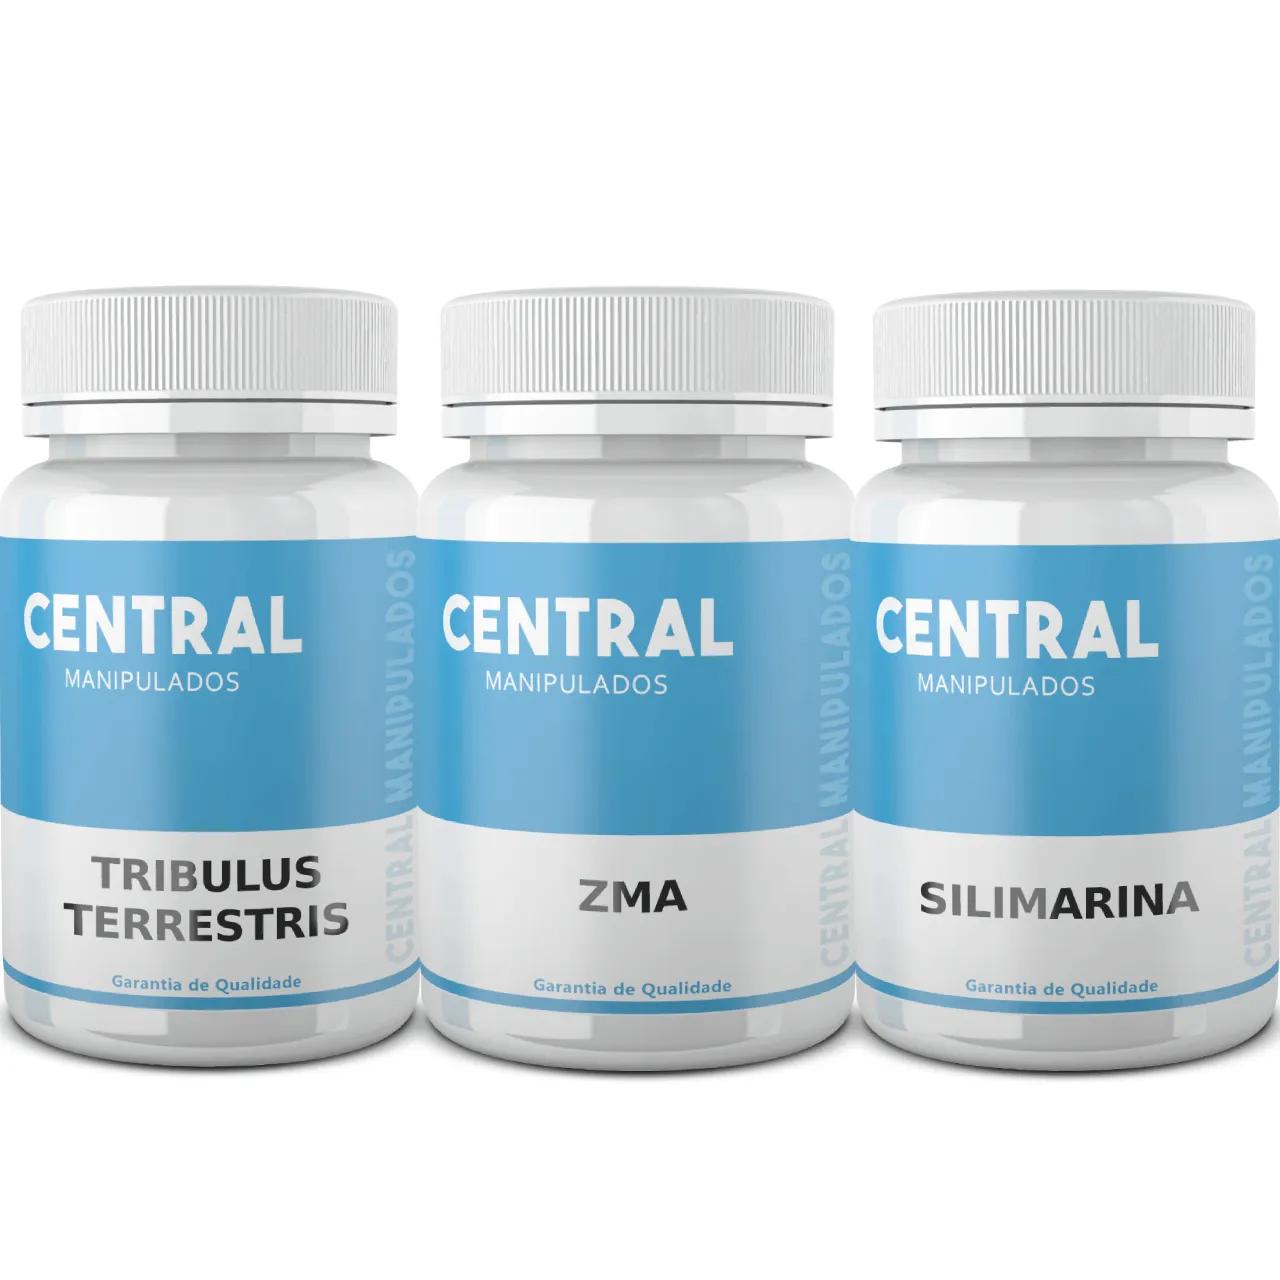 Tribulus Terrestris + ZMA + Silimarina - 60 cápsulas de cada, TOTAL 180 cápsulas